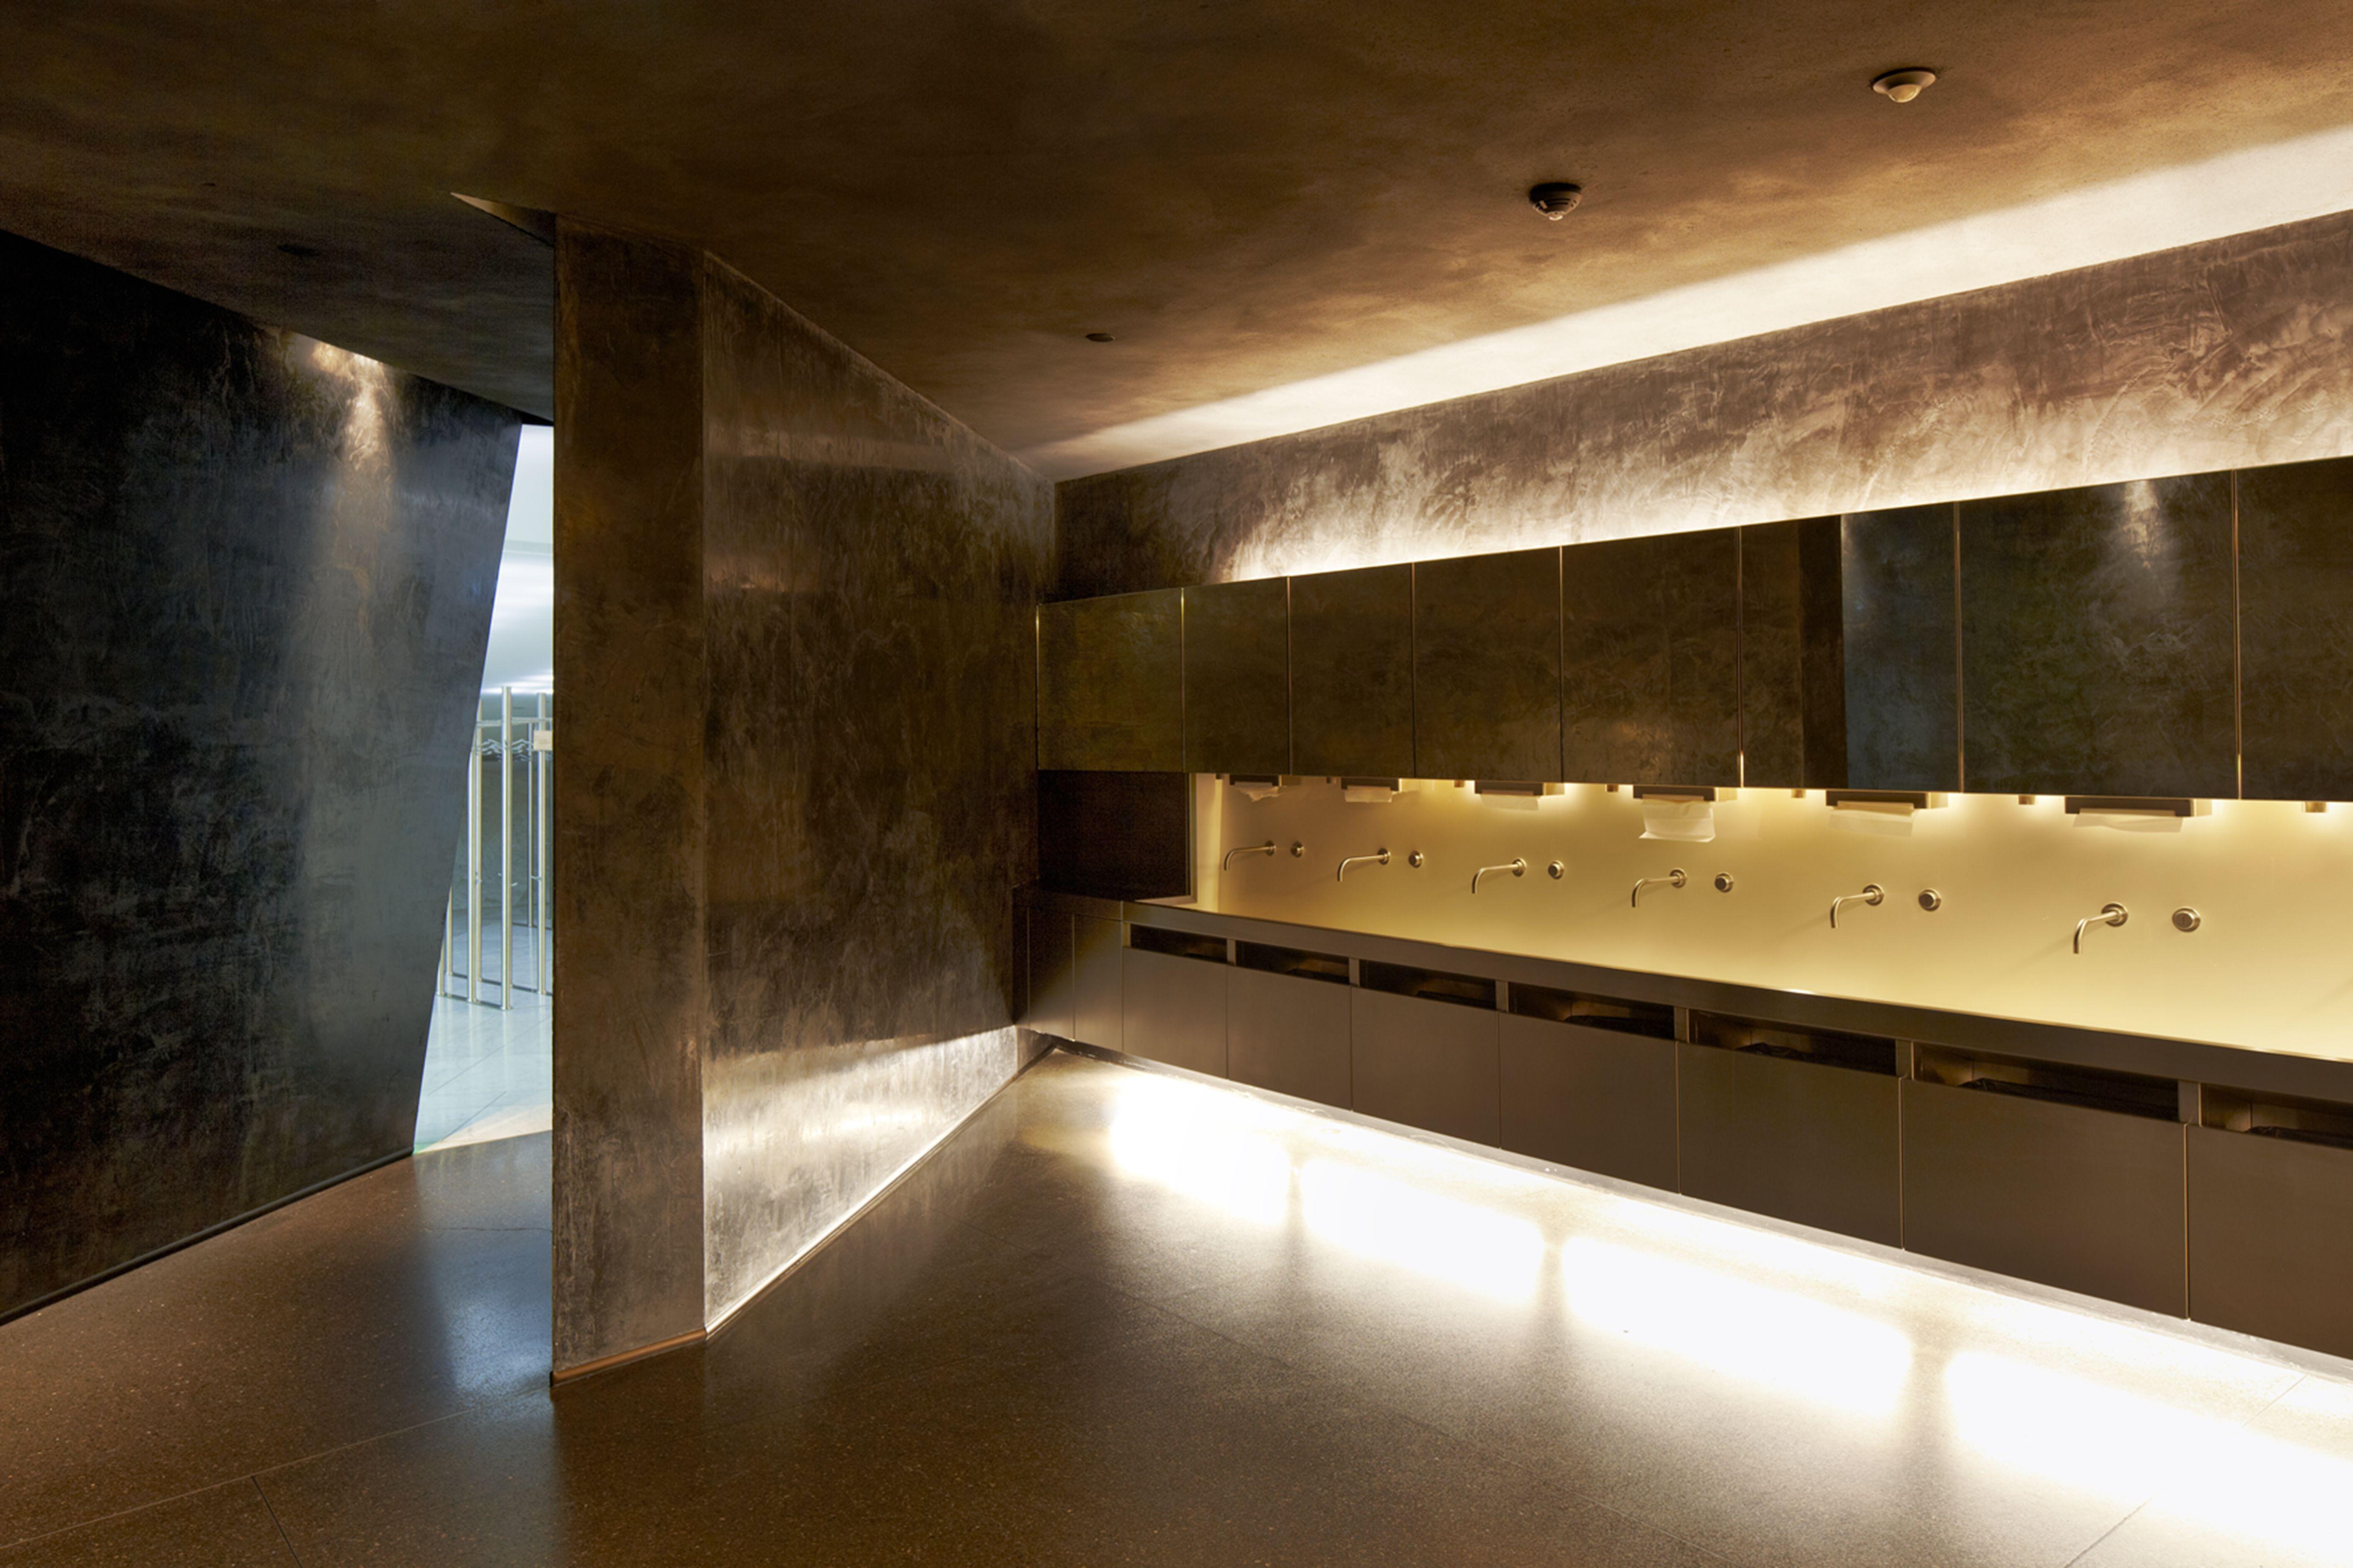 Snohettas Design For The Oslo Opera House